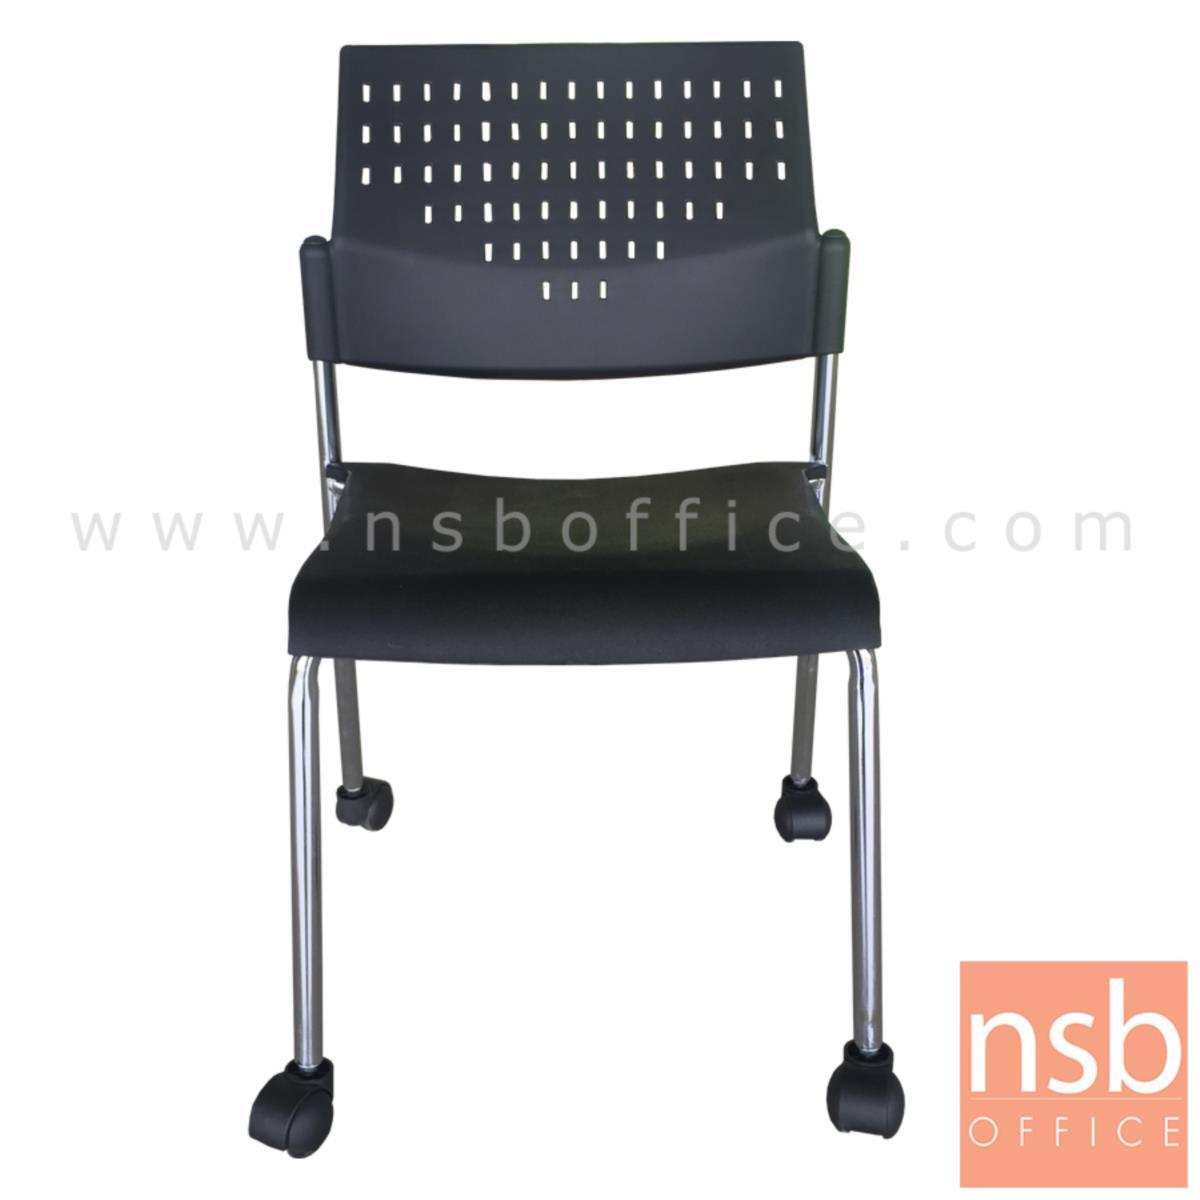 B29A054:เก้าอี้อเนกประสงค์เฟรมโพลี่ รุ่น Steelbeak (สตีลบีค)  ขาเหล็กชุบโครเมี่ยม ล้อเลื่อน